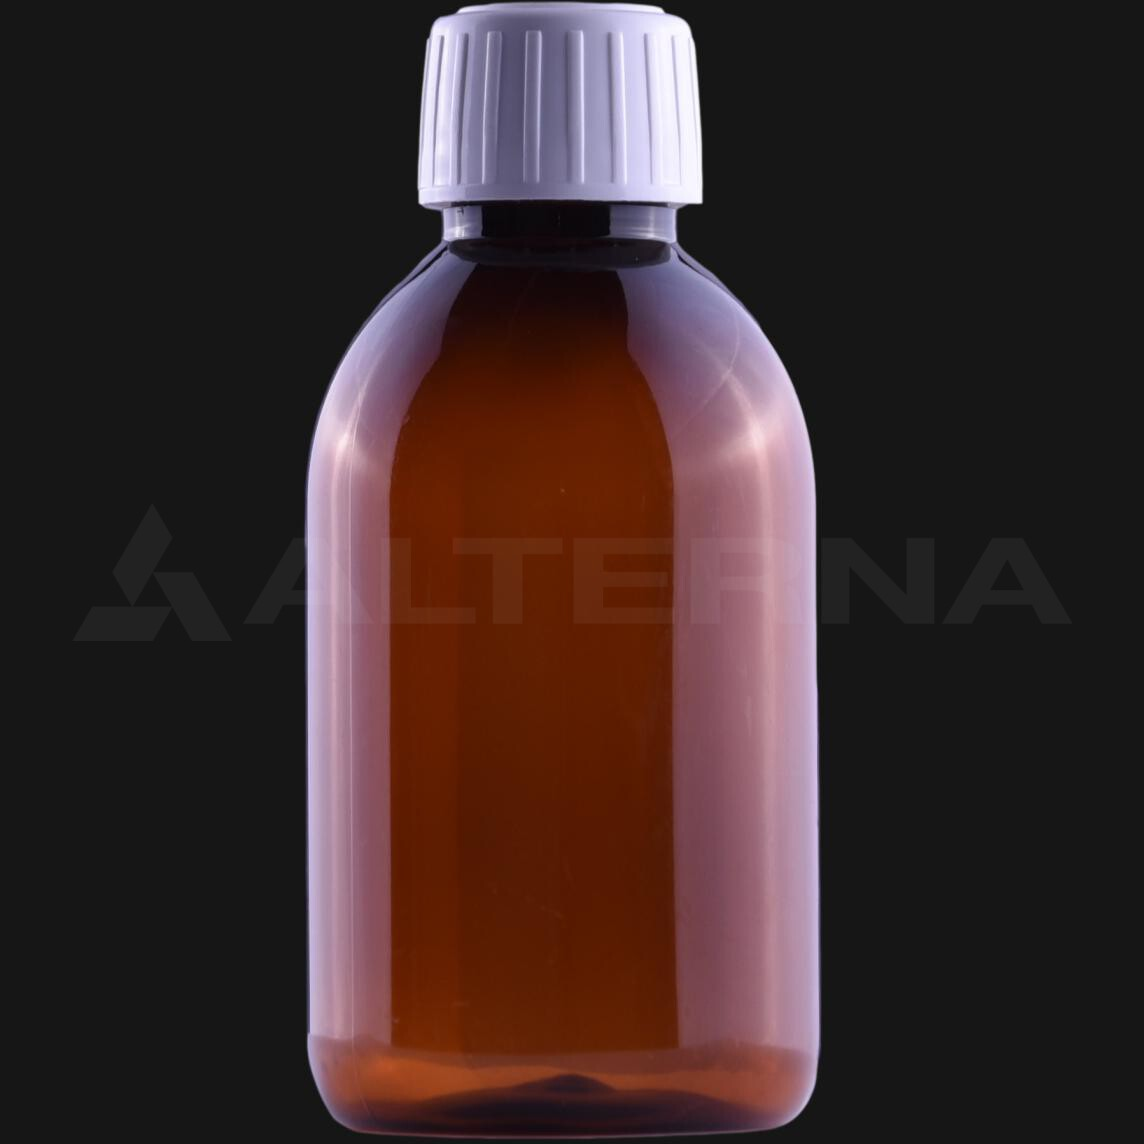 150 ml PET Pharma Bottle with 25 mm Tamper Evident Cap